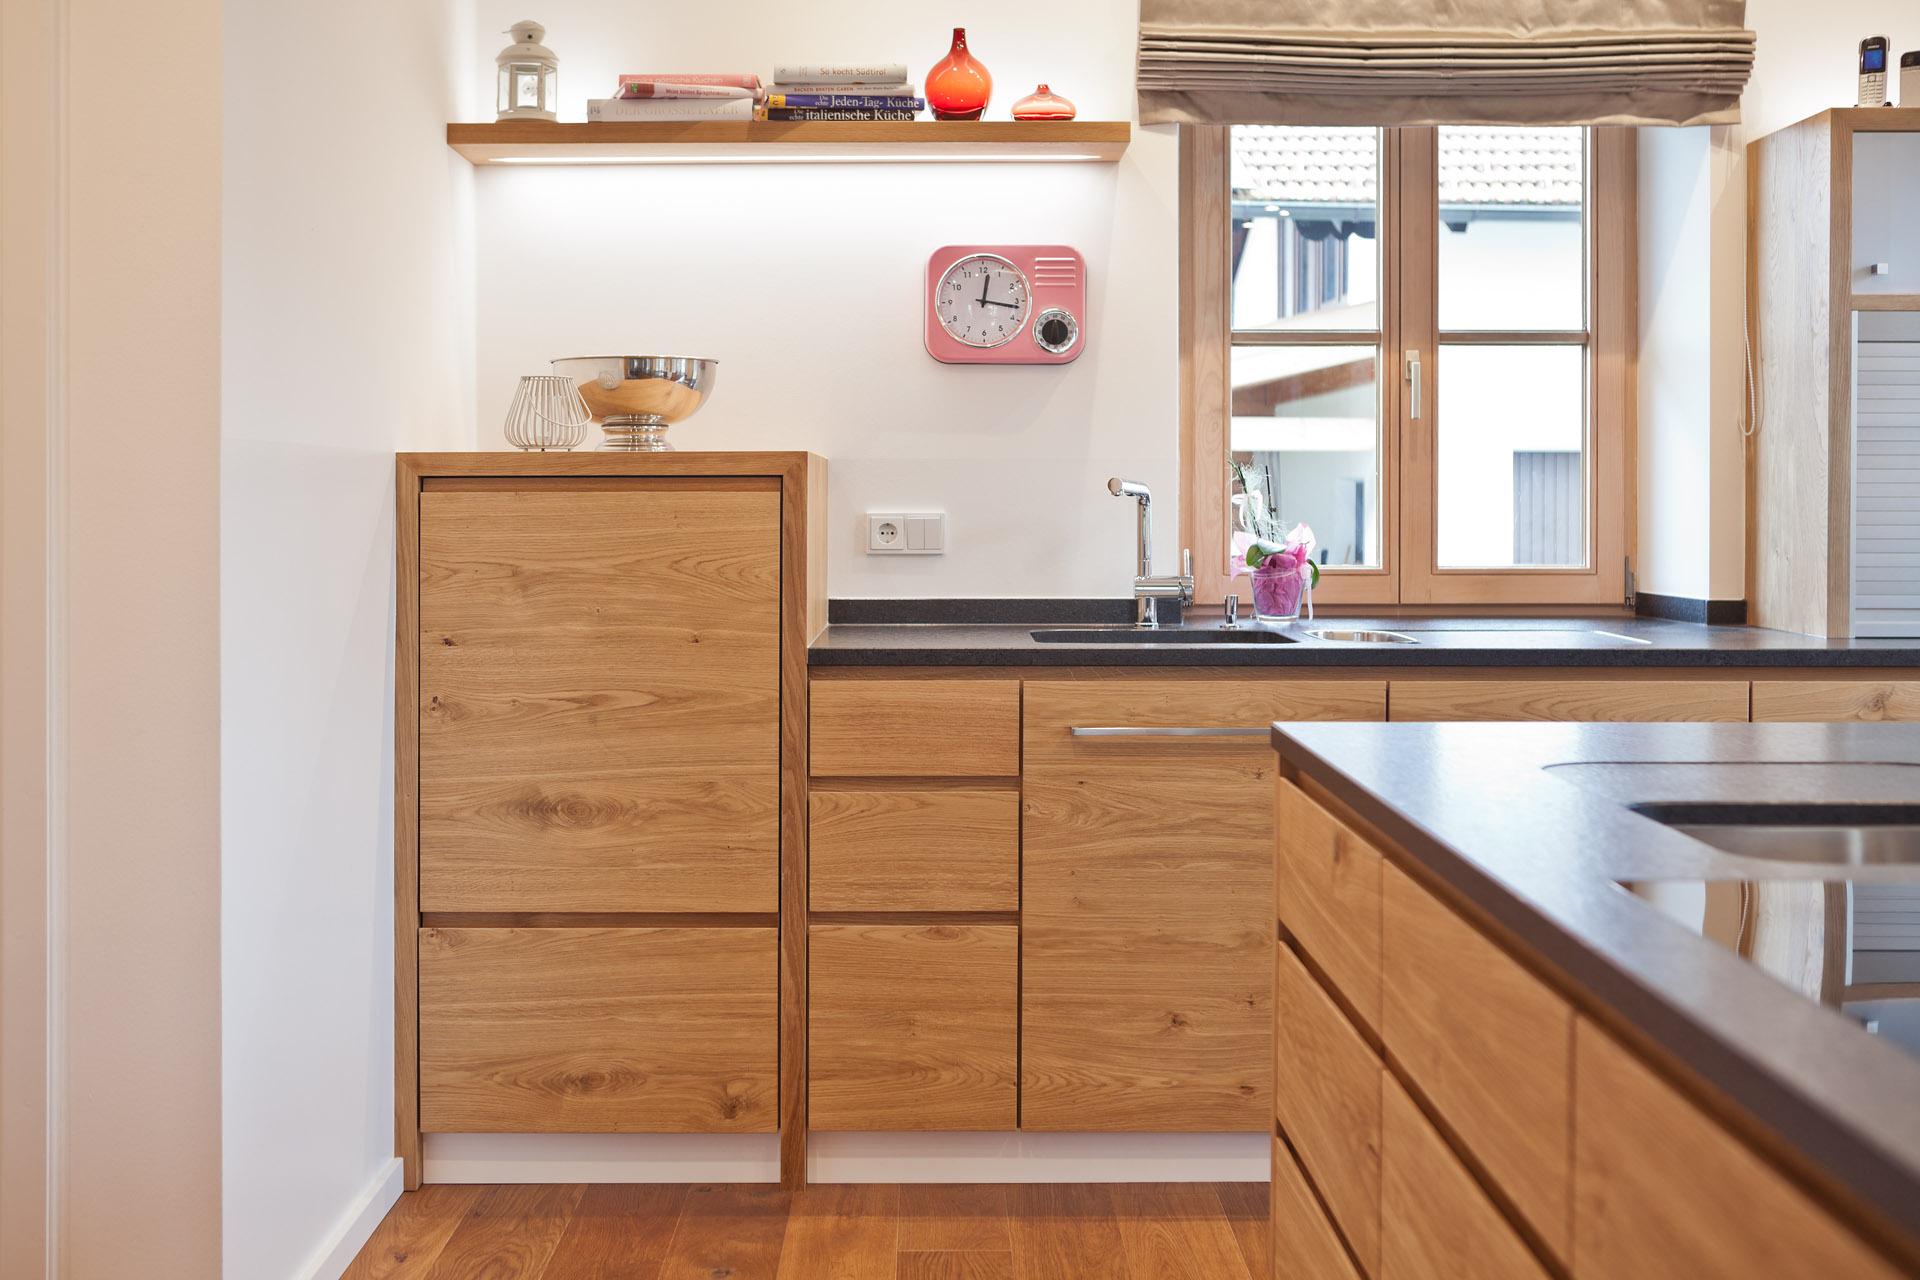 Deml Design - Exklusive Küche - Interieur - Paul Günther · Photodesign